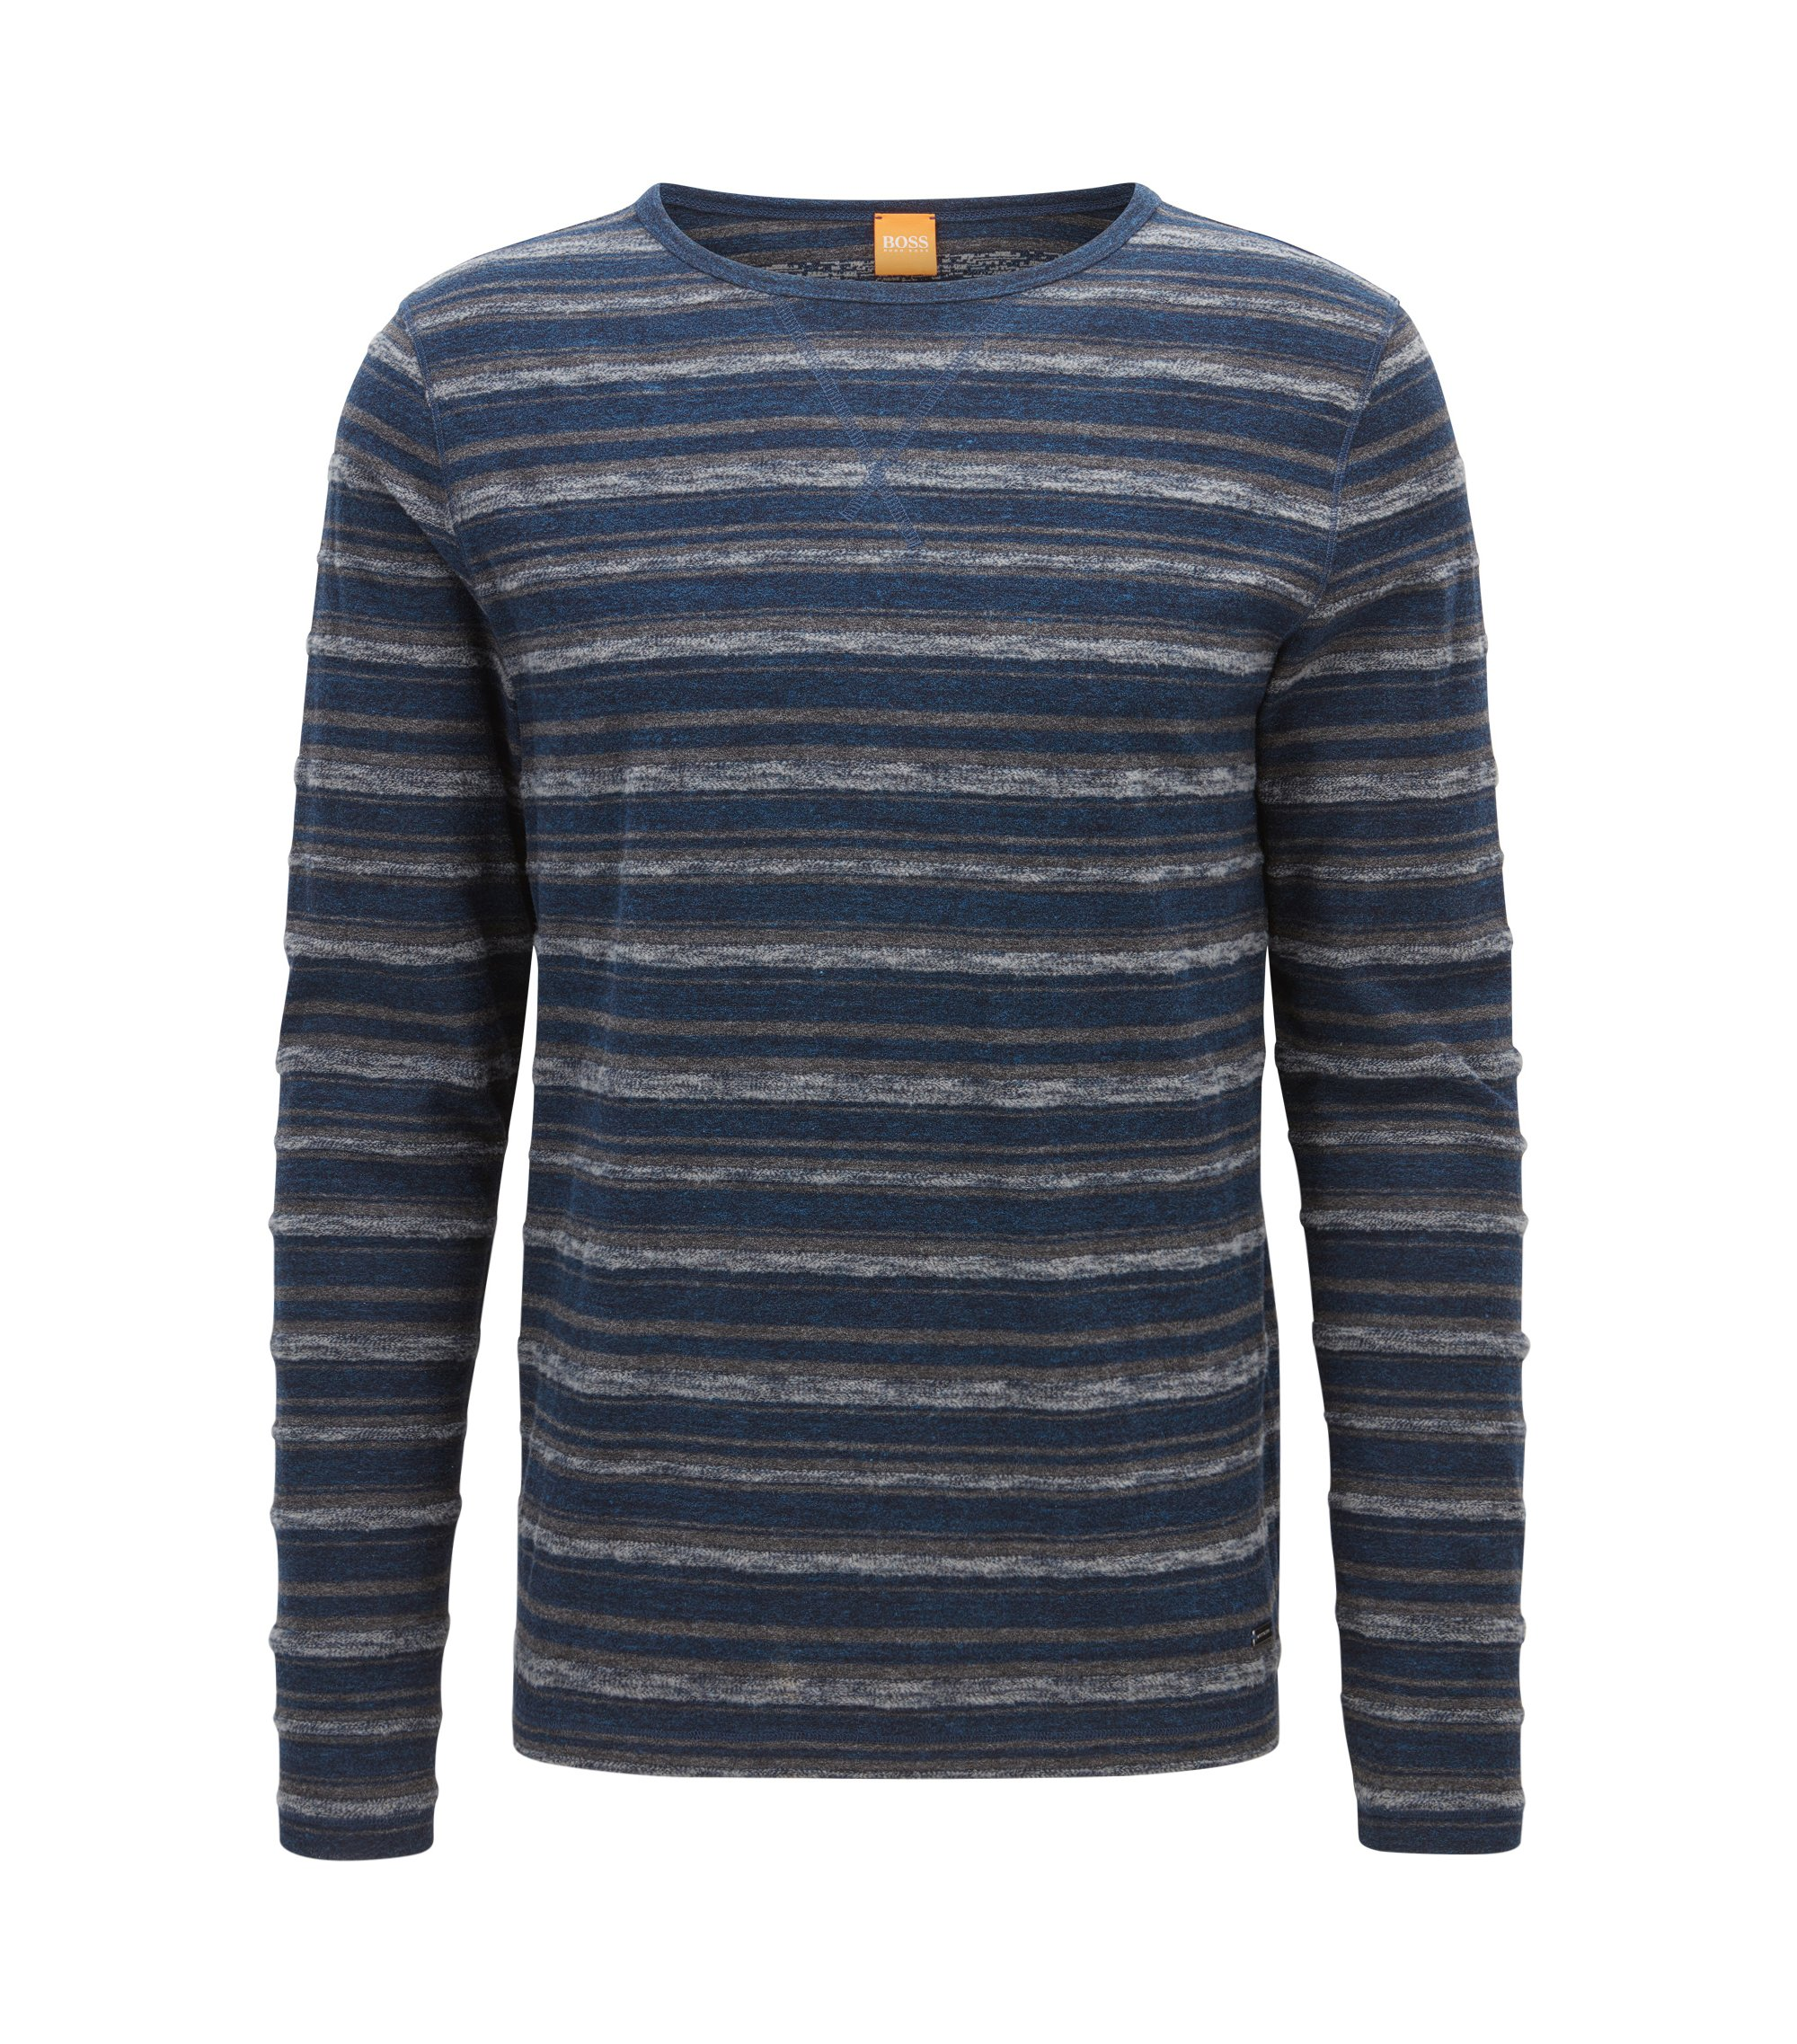 Striped Stretch Cotton T-Shirt | Twinkle, Dark Blue